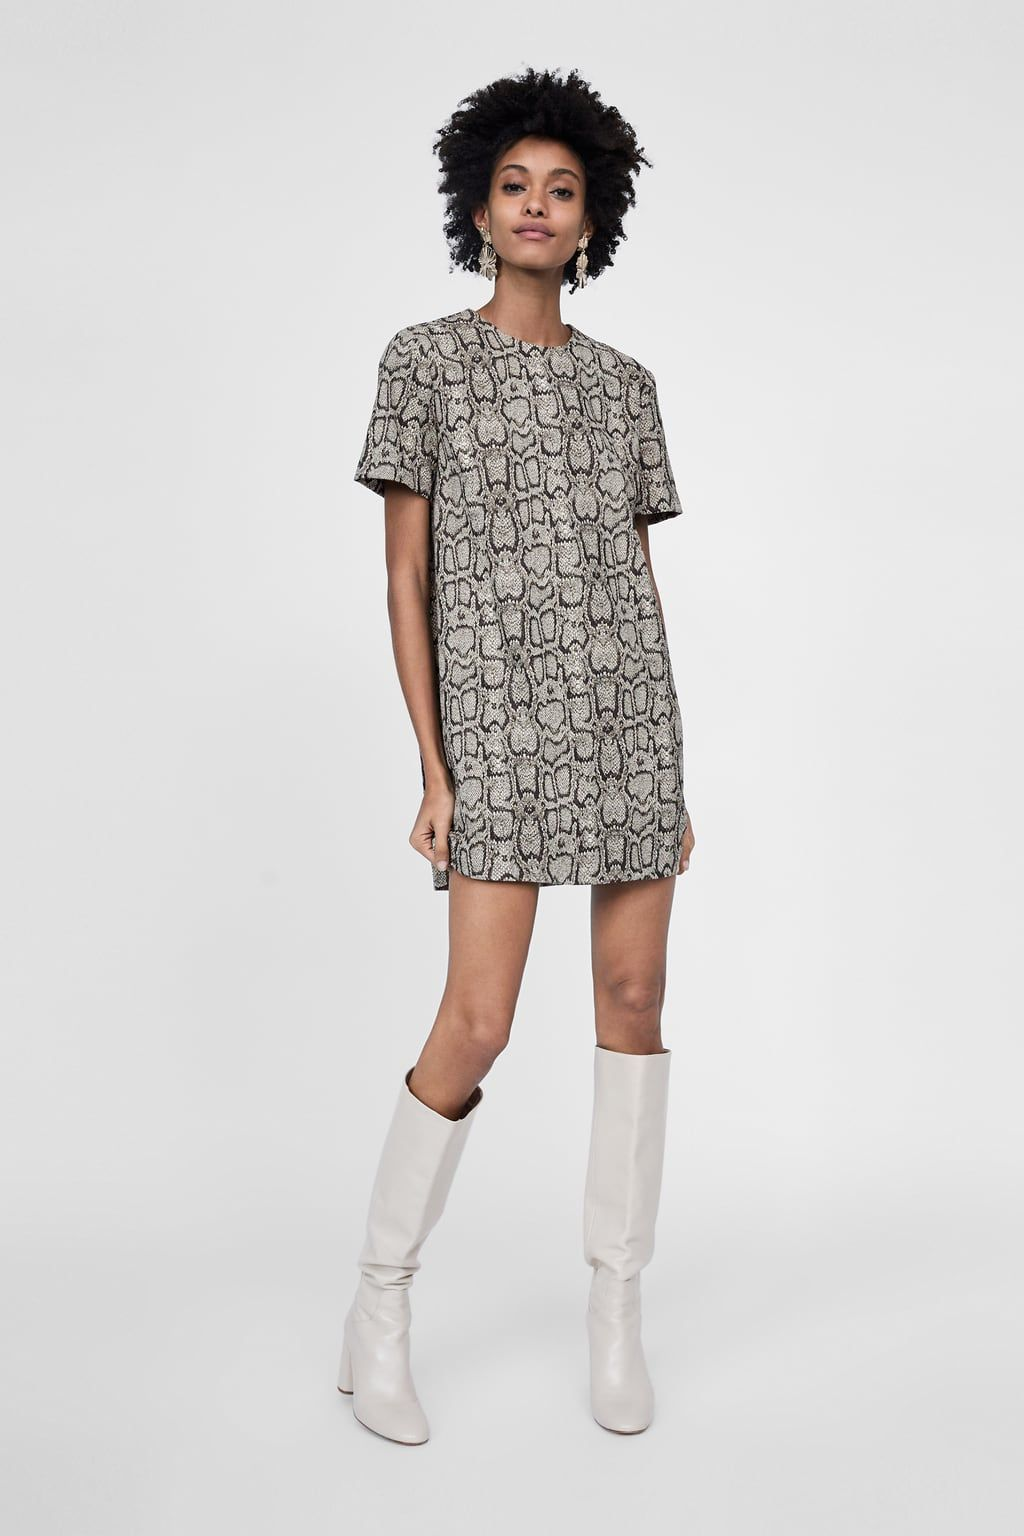 669b5354 Snakeskin print jacquard dress in 2019 | Real Life Fashion ...